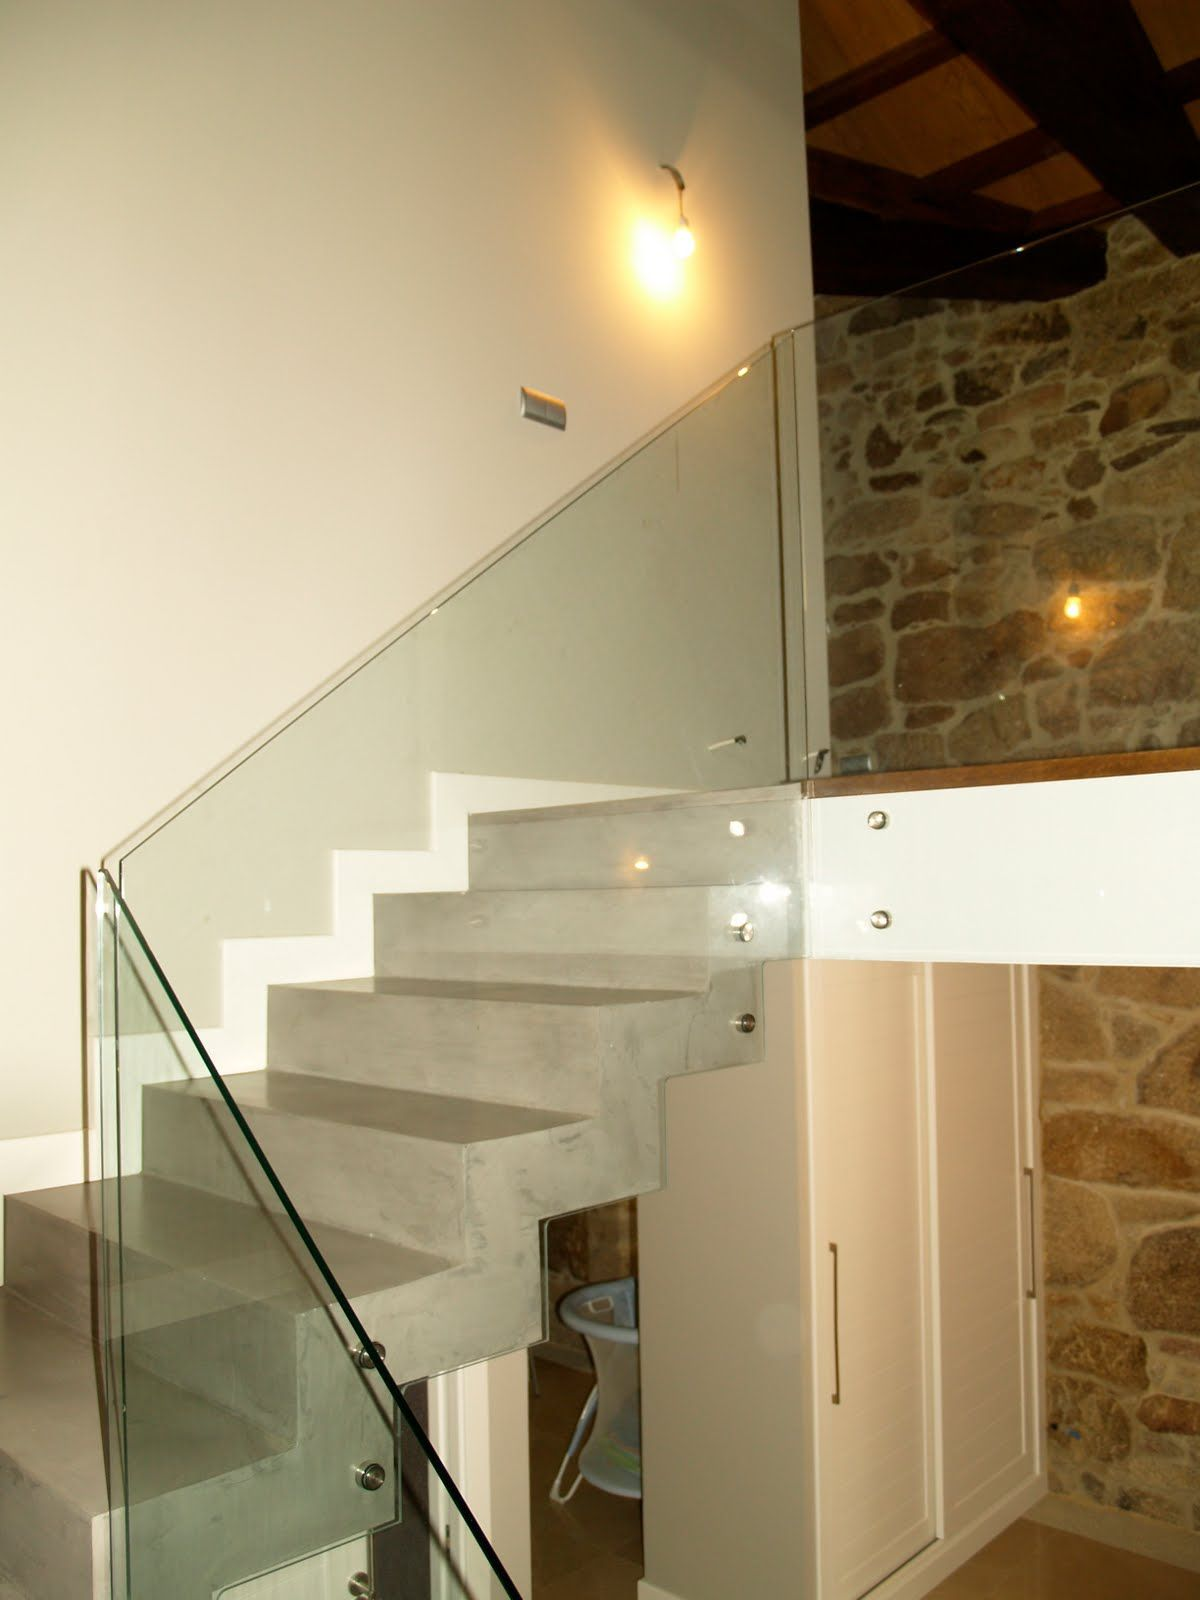 Barandilla vidrio templado para casa pinterest for Barandilla escalera exterior